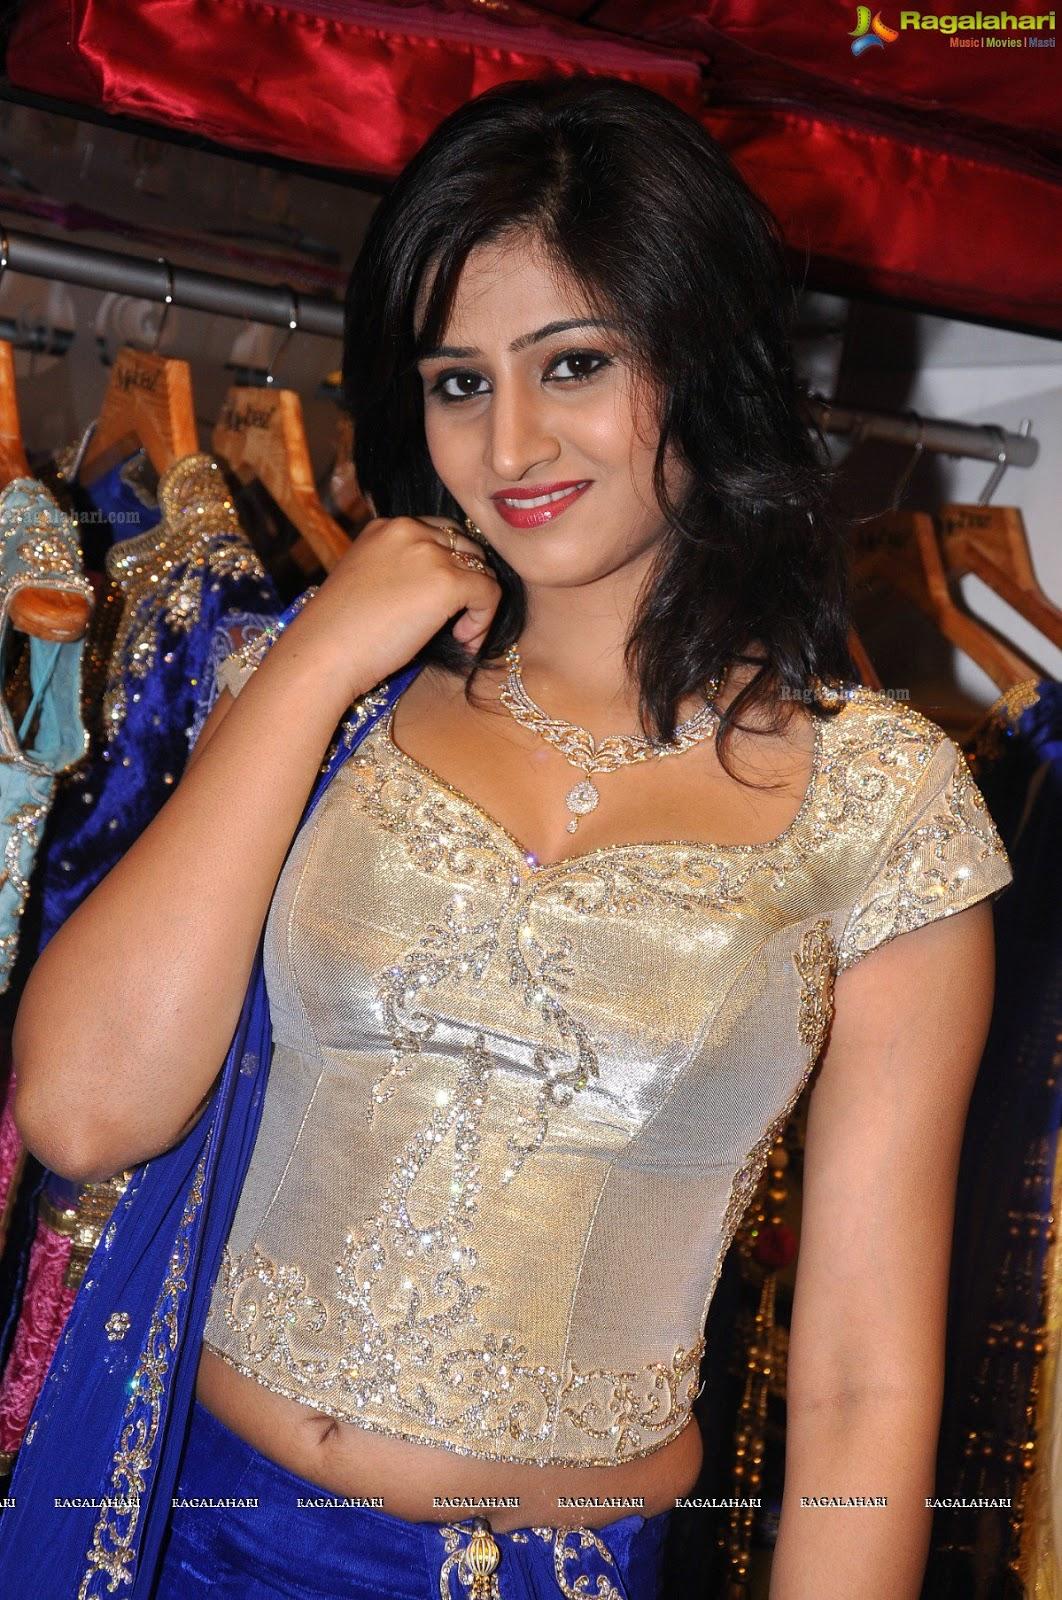 Varshini (aka) Vaarshini photos stills & images